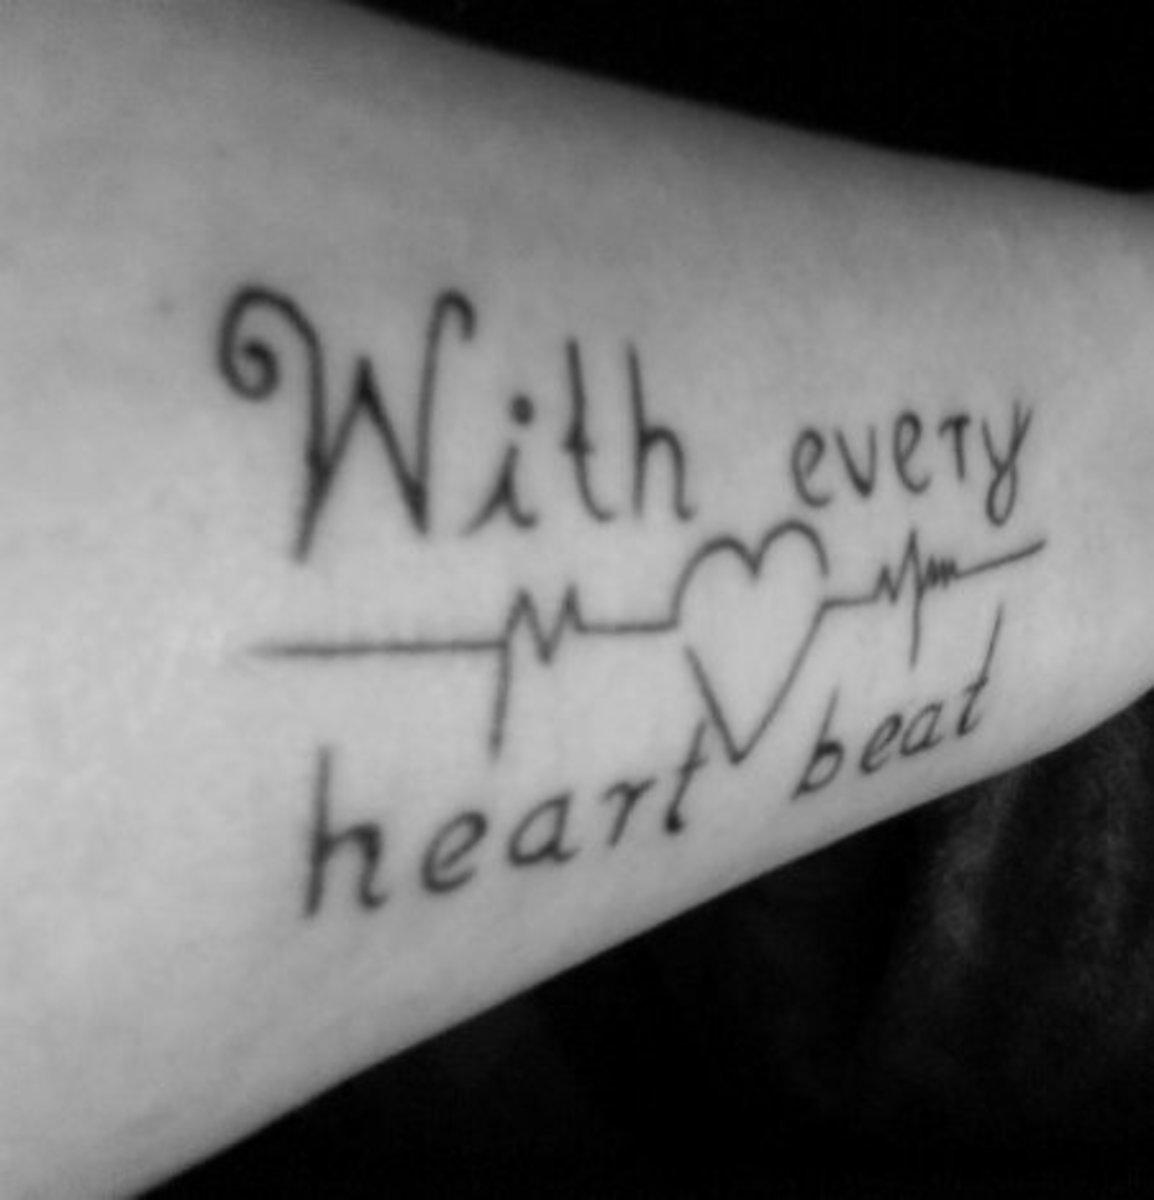 heartbeatekgtattoolinedesigngalleryphotos